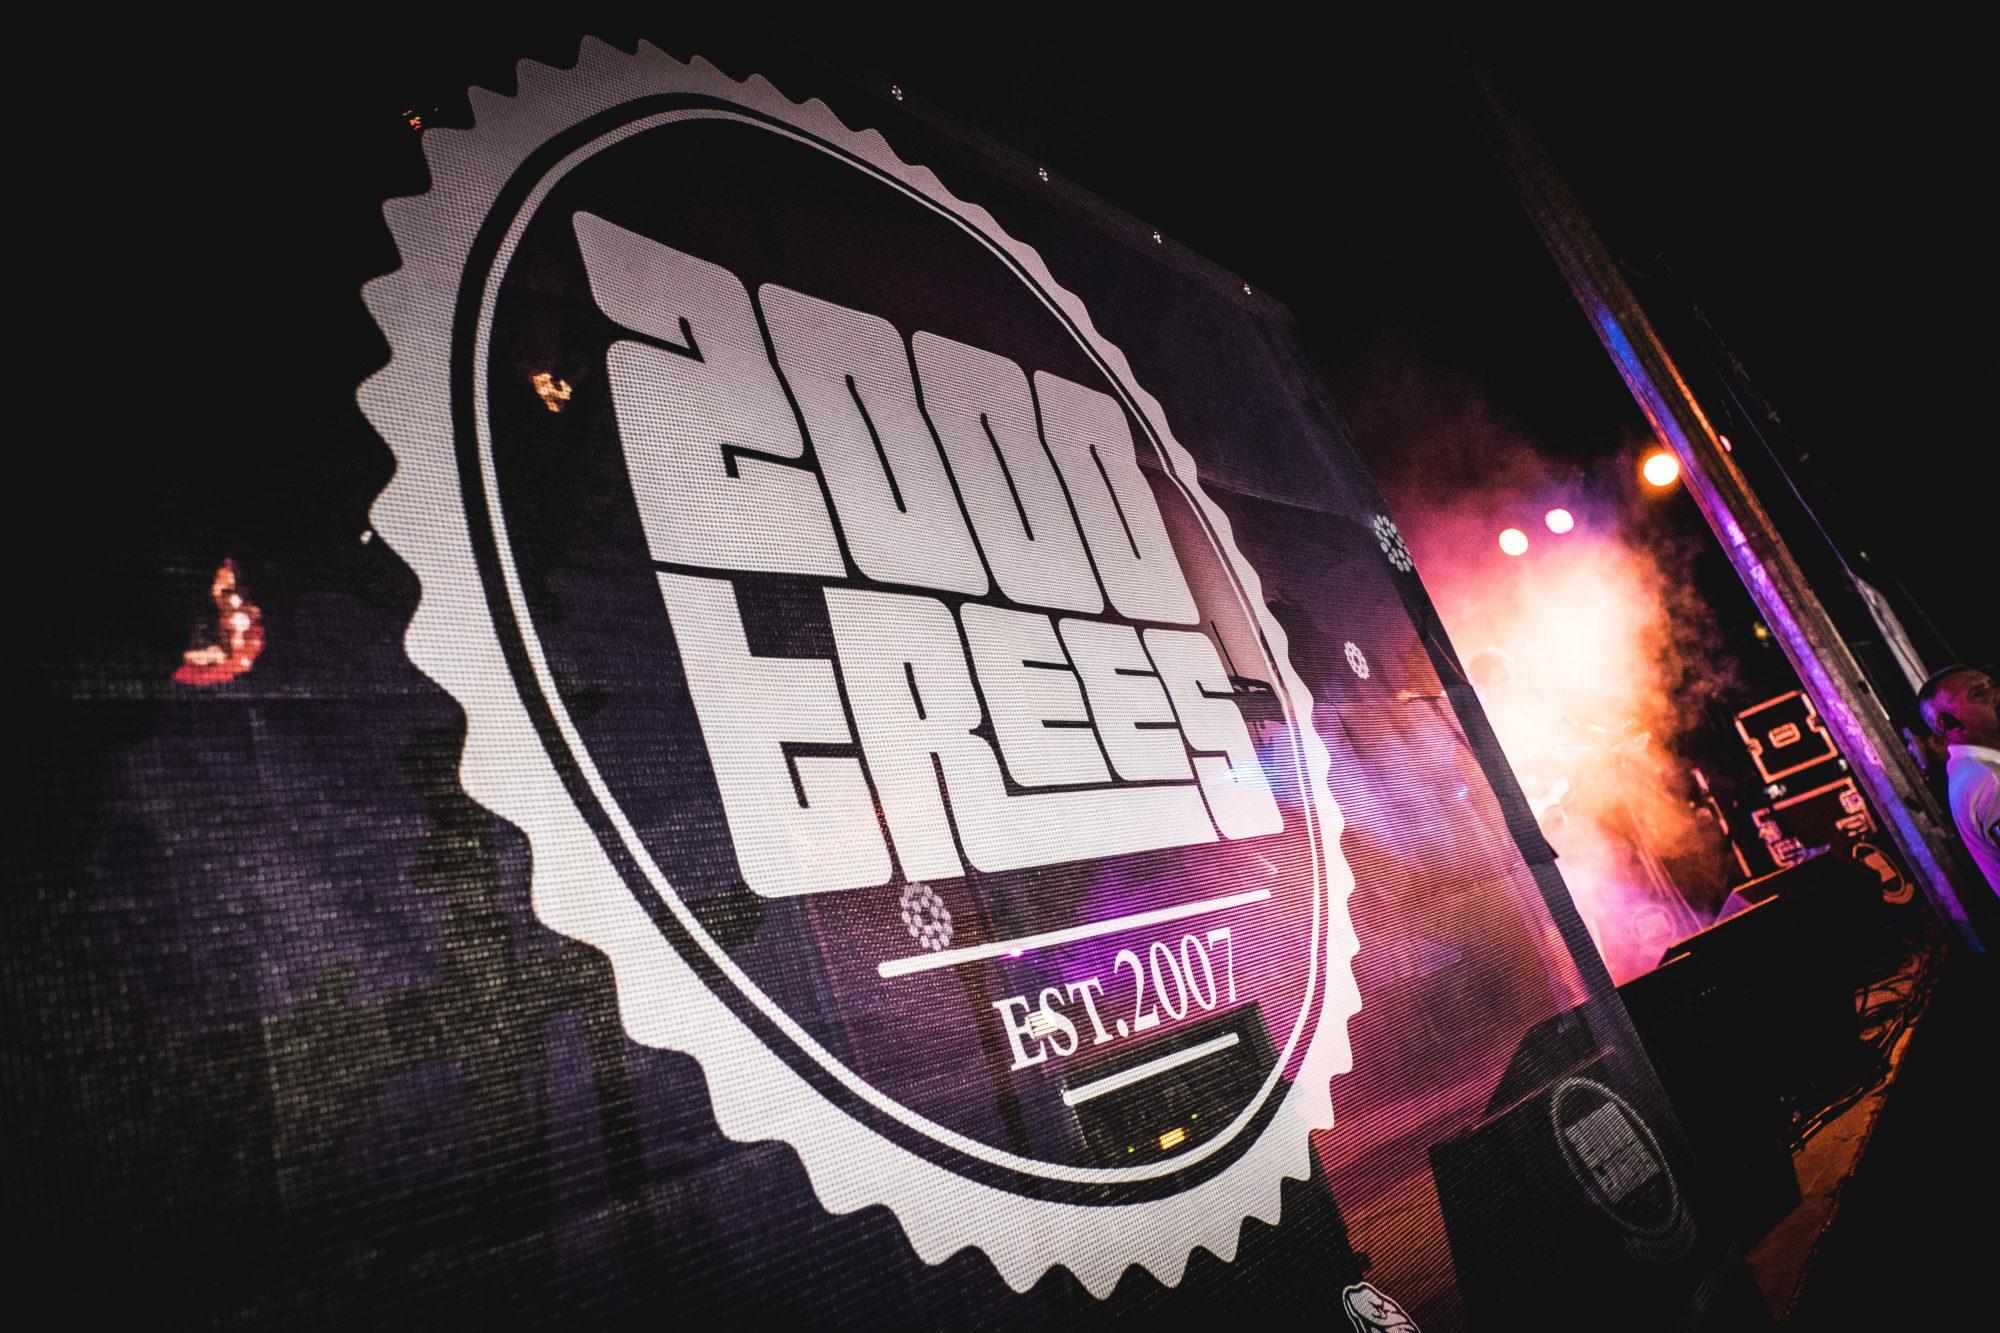 2000tress Festival